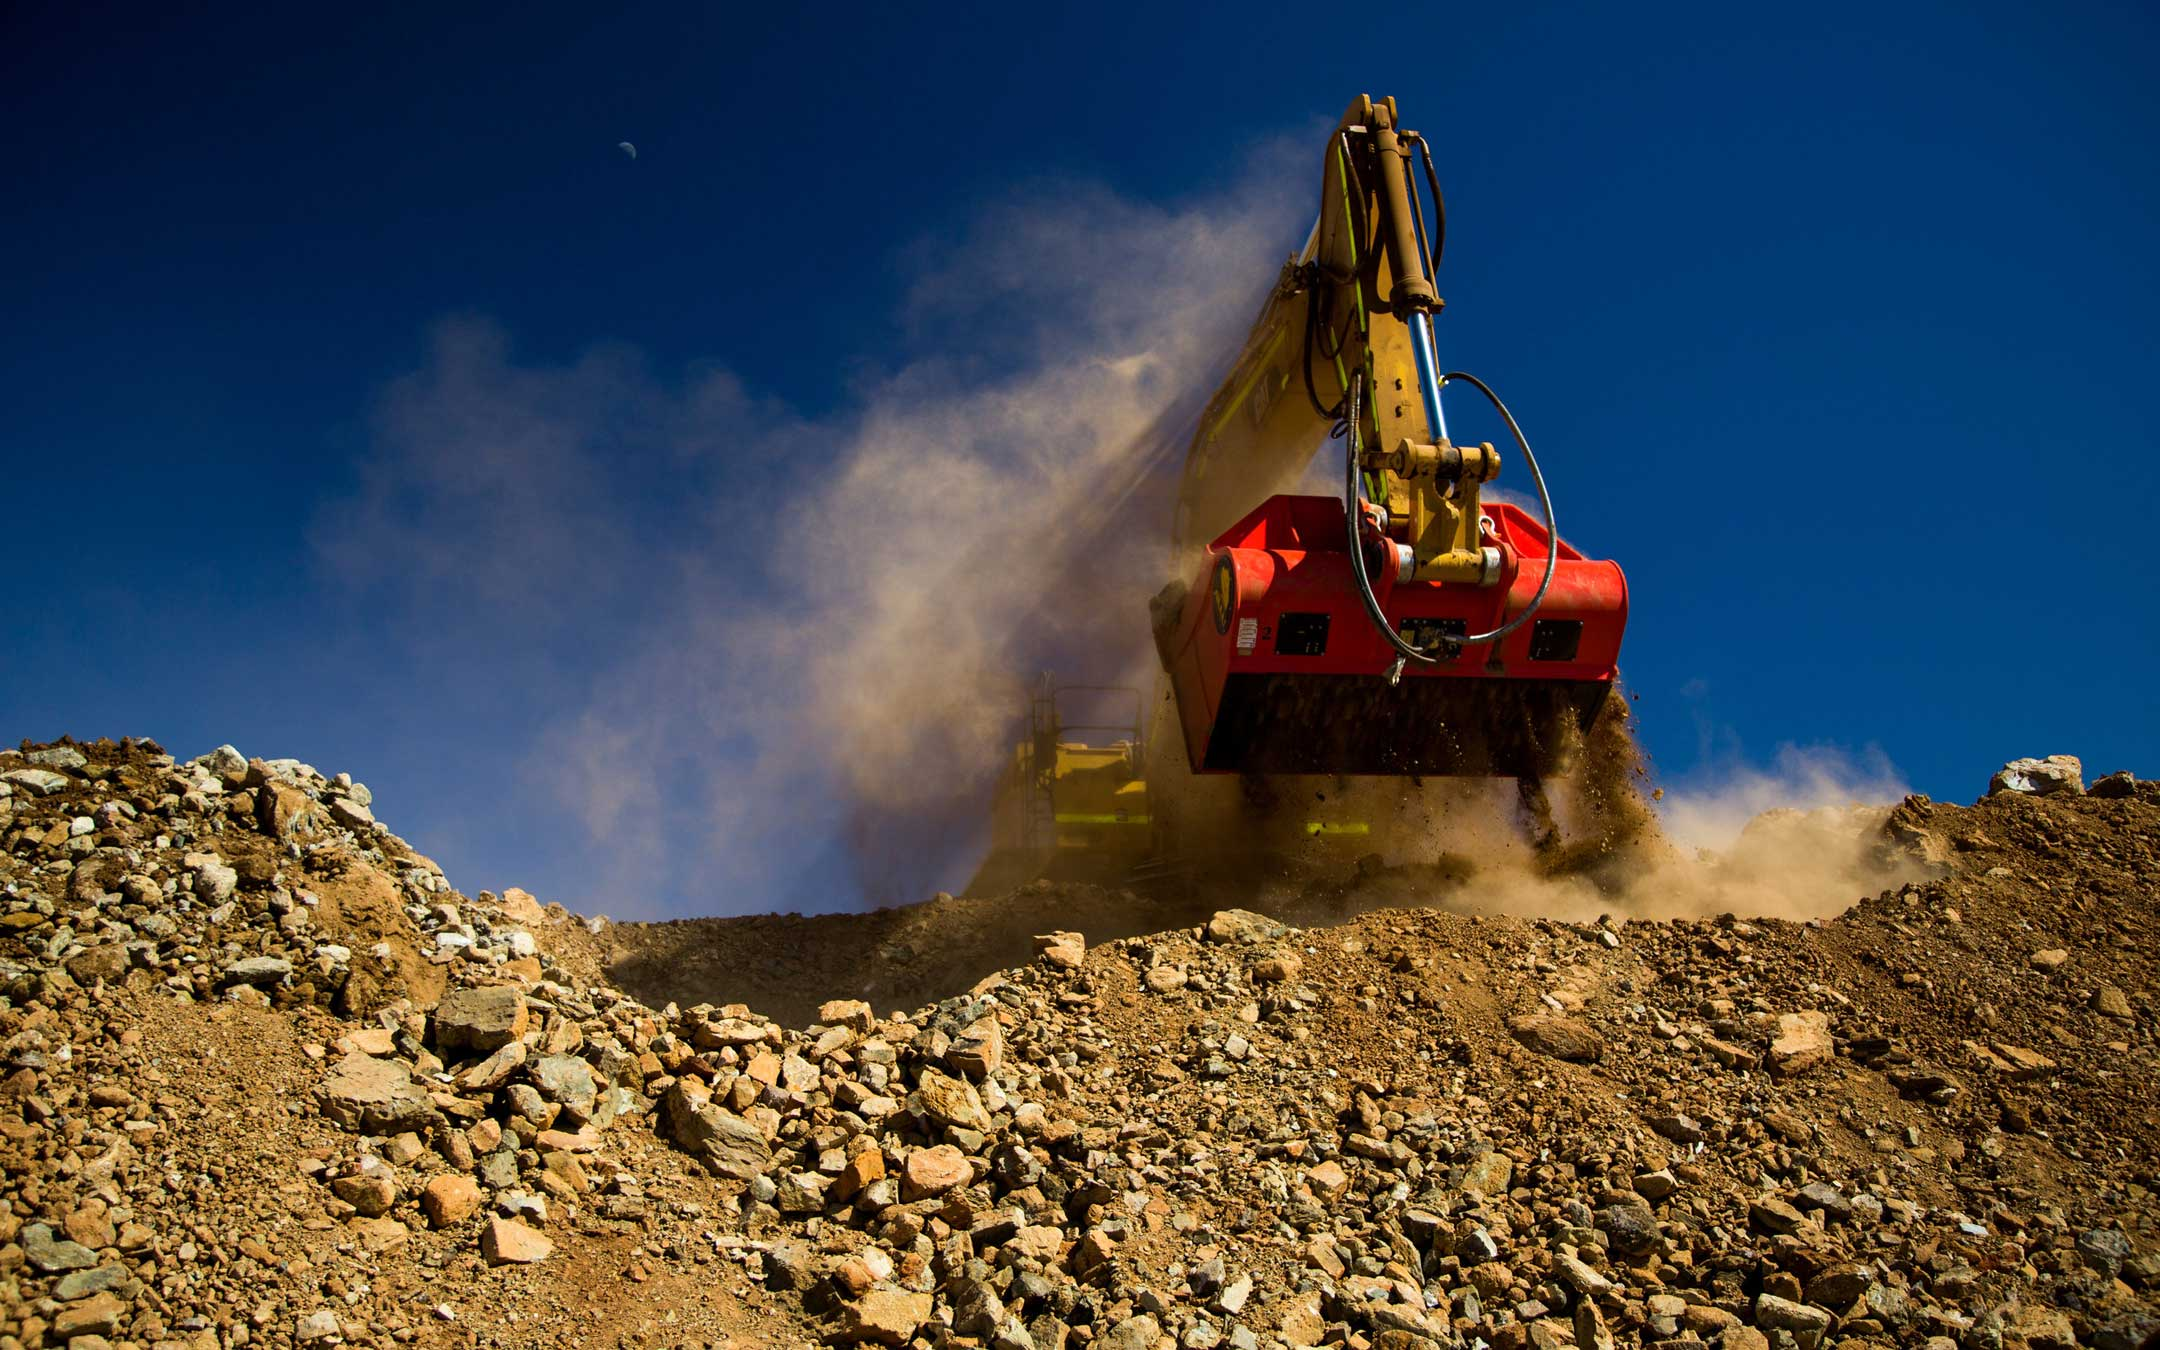 Mining equipments